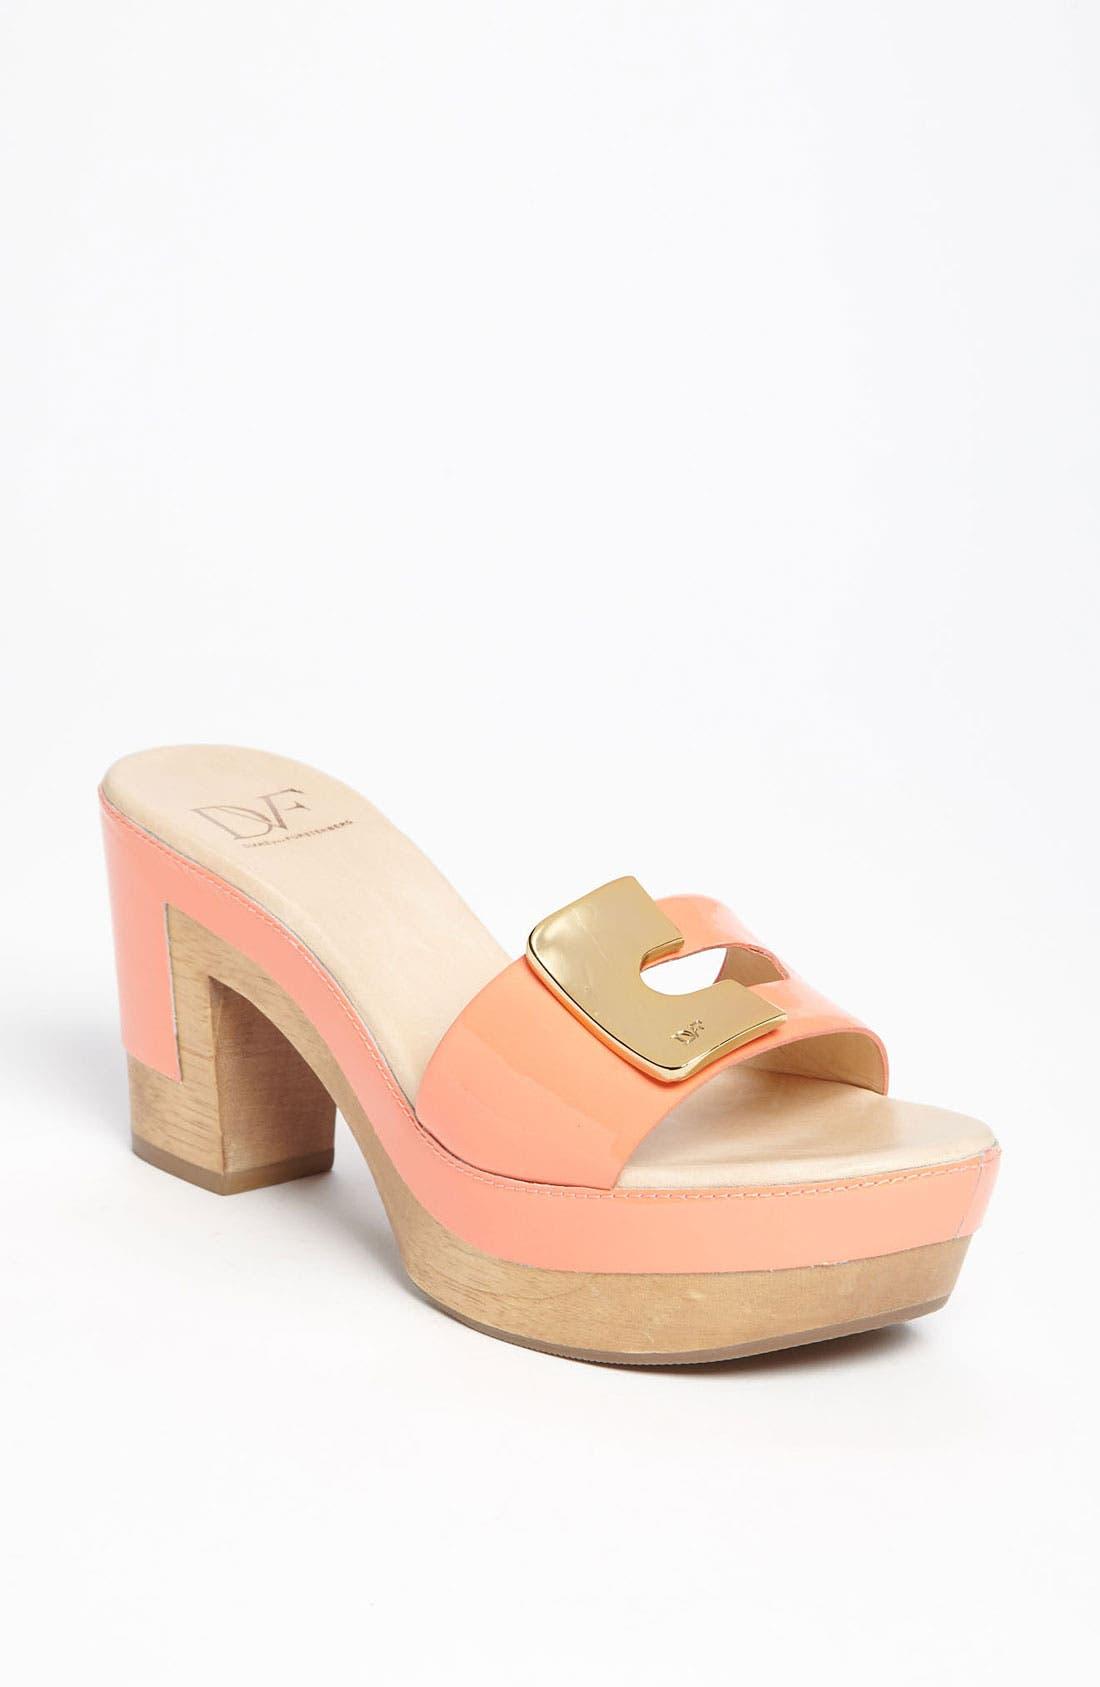 Main Image - Diane von Furstenberg 'Straton' Sandal